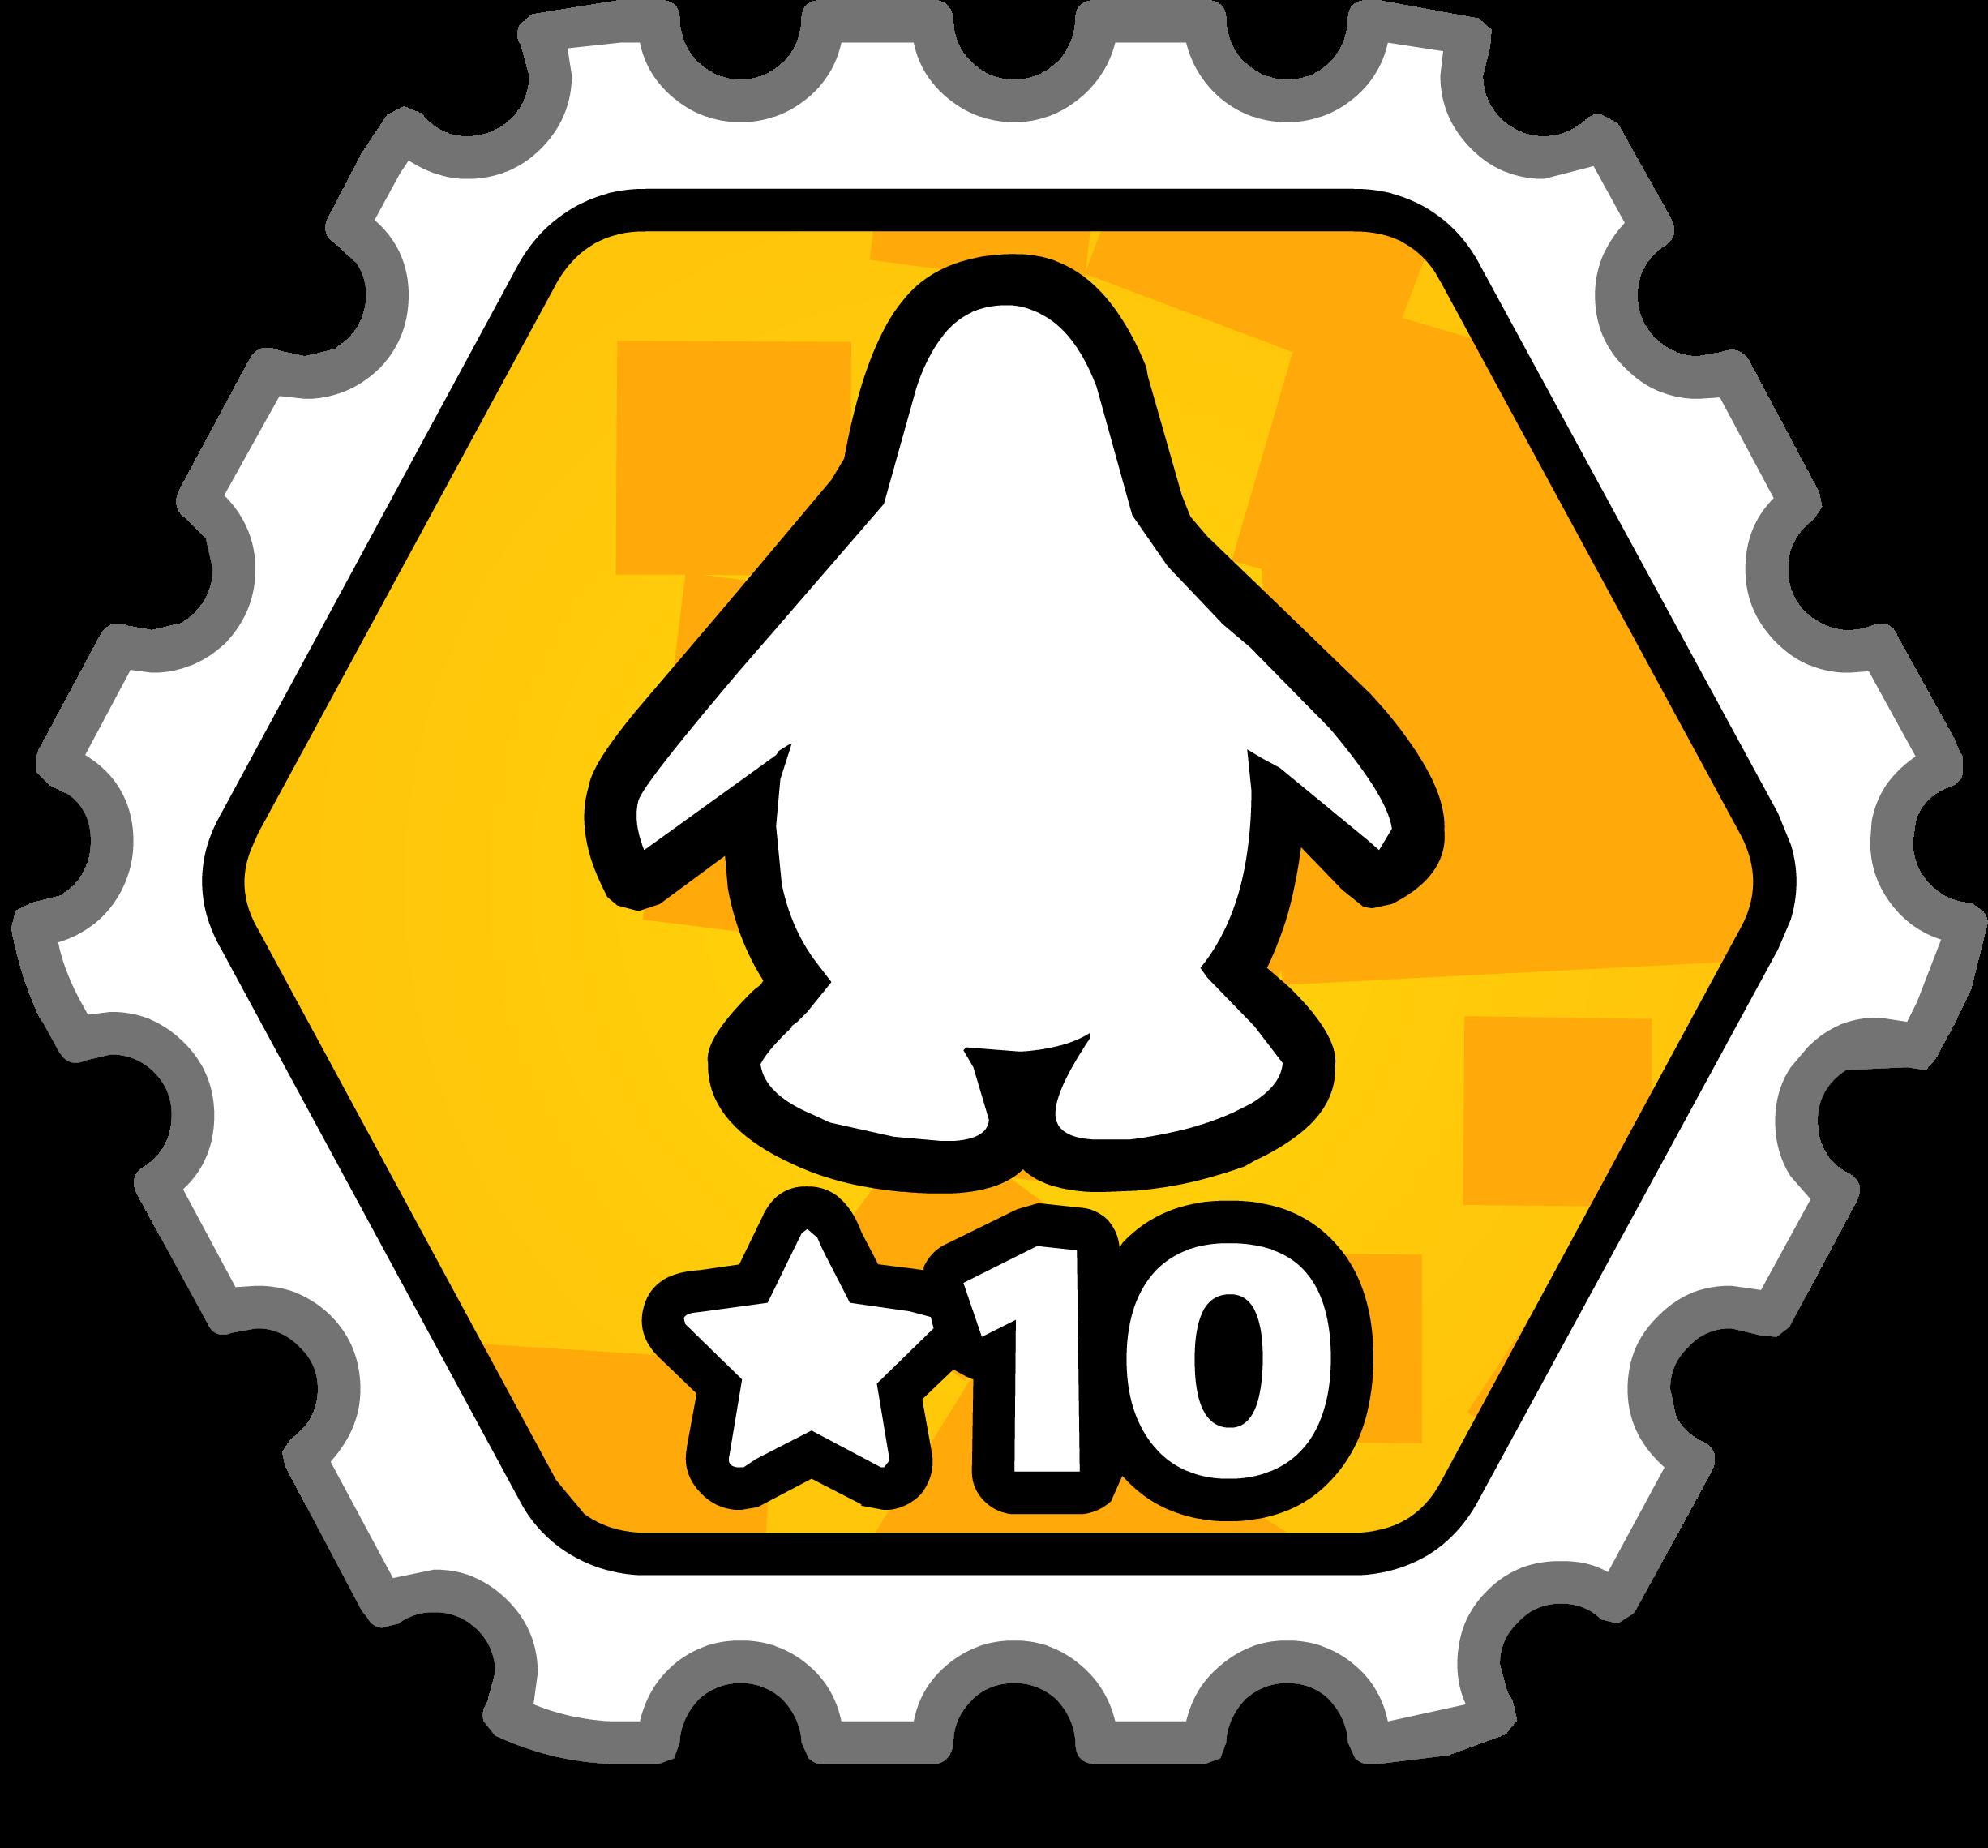 10 Sea Levels Stamp